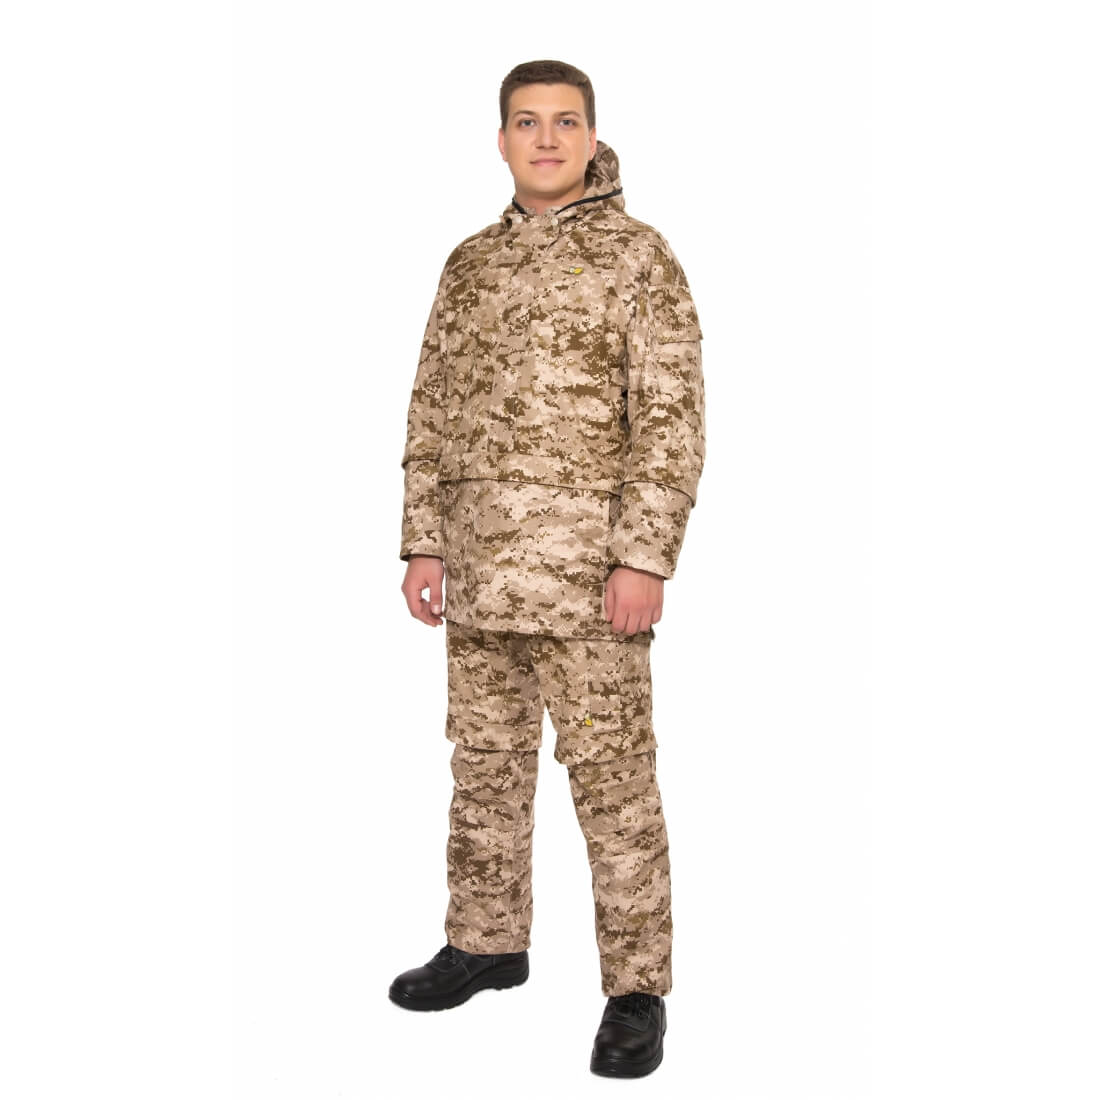 Мужской костюм Биостоп® Оптимум